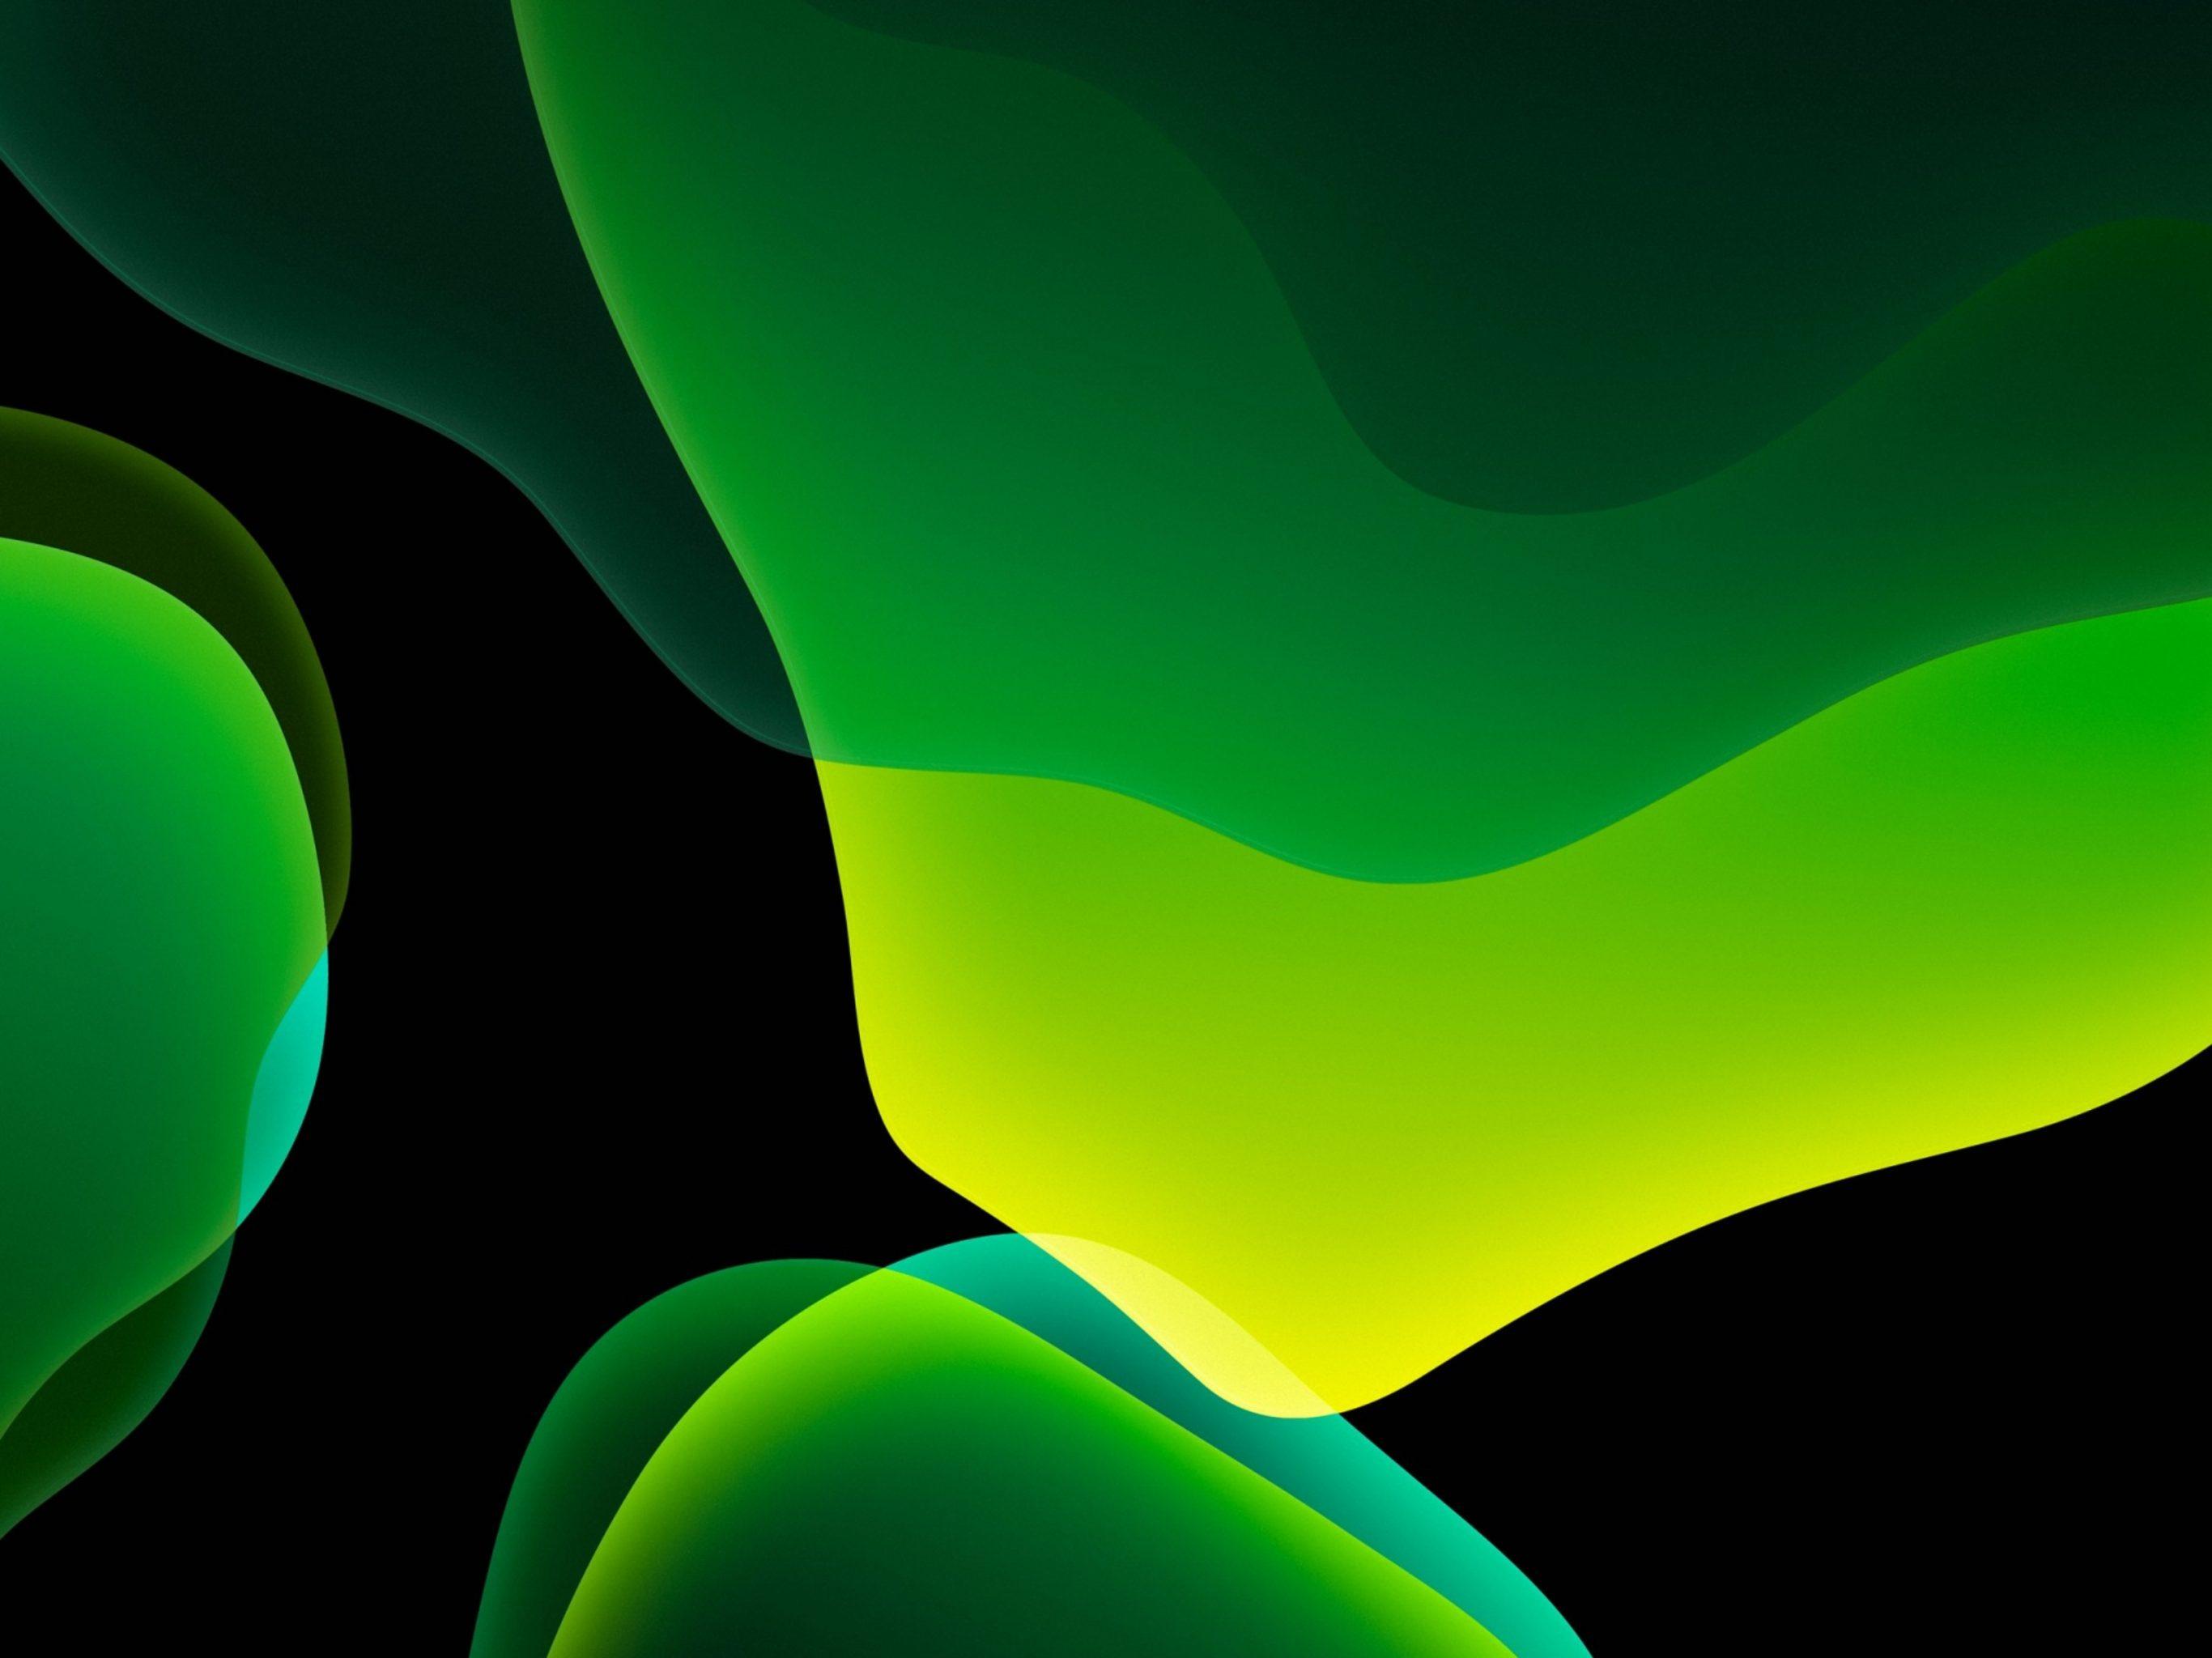 2732x2048 iPad air iPad Pro wallpapers Green Dark Ipados Ipad Wallpaper 2732x2048 pixels resolution